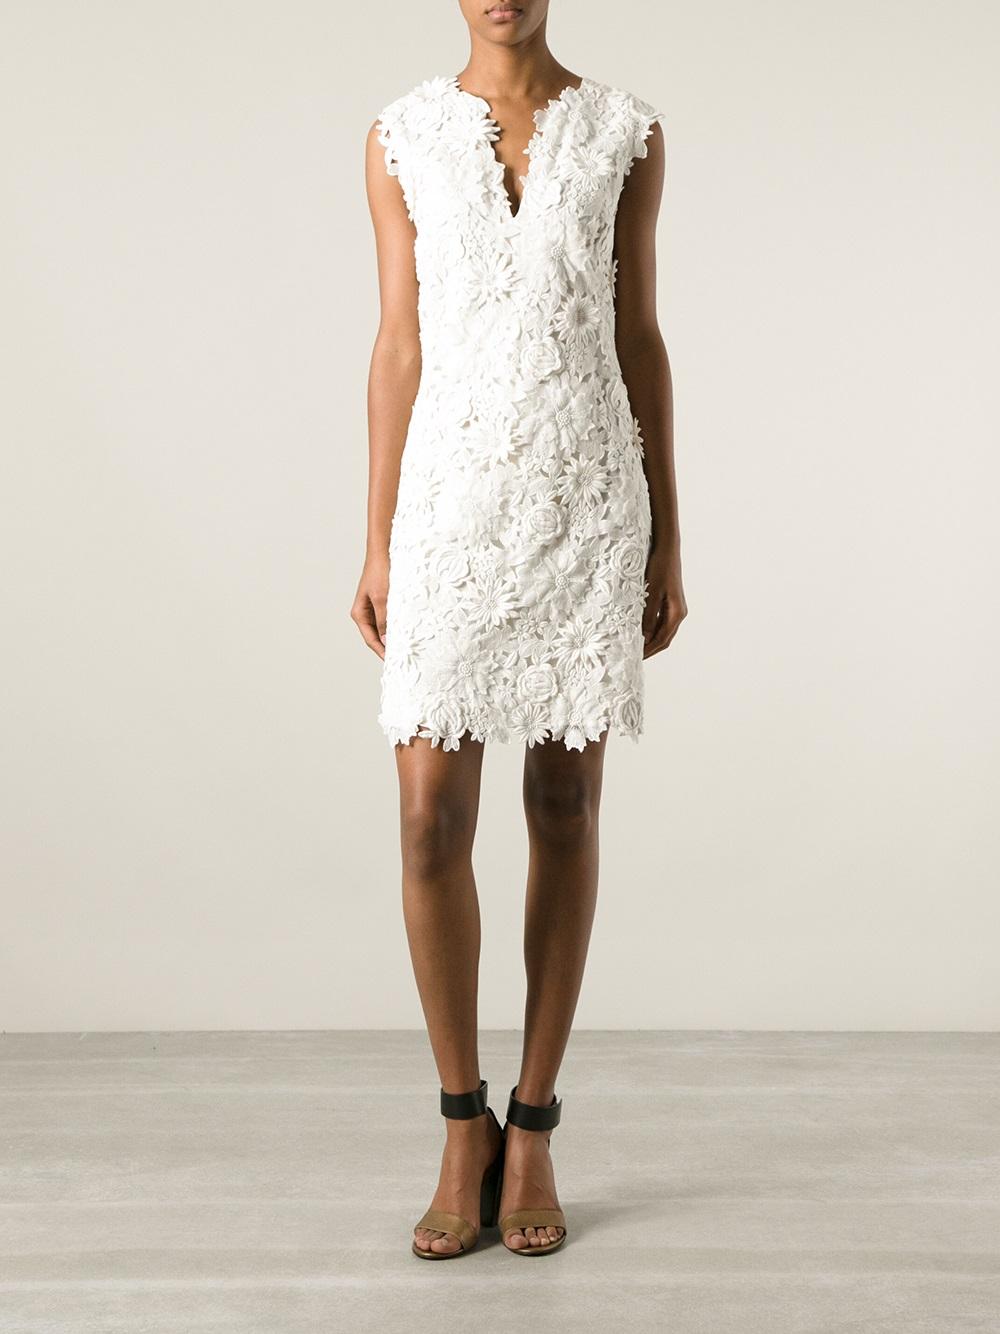 Lyst Tory Burch Merida Dress In White